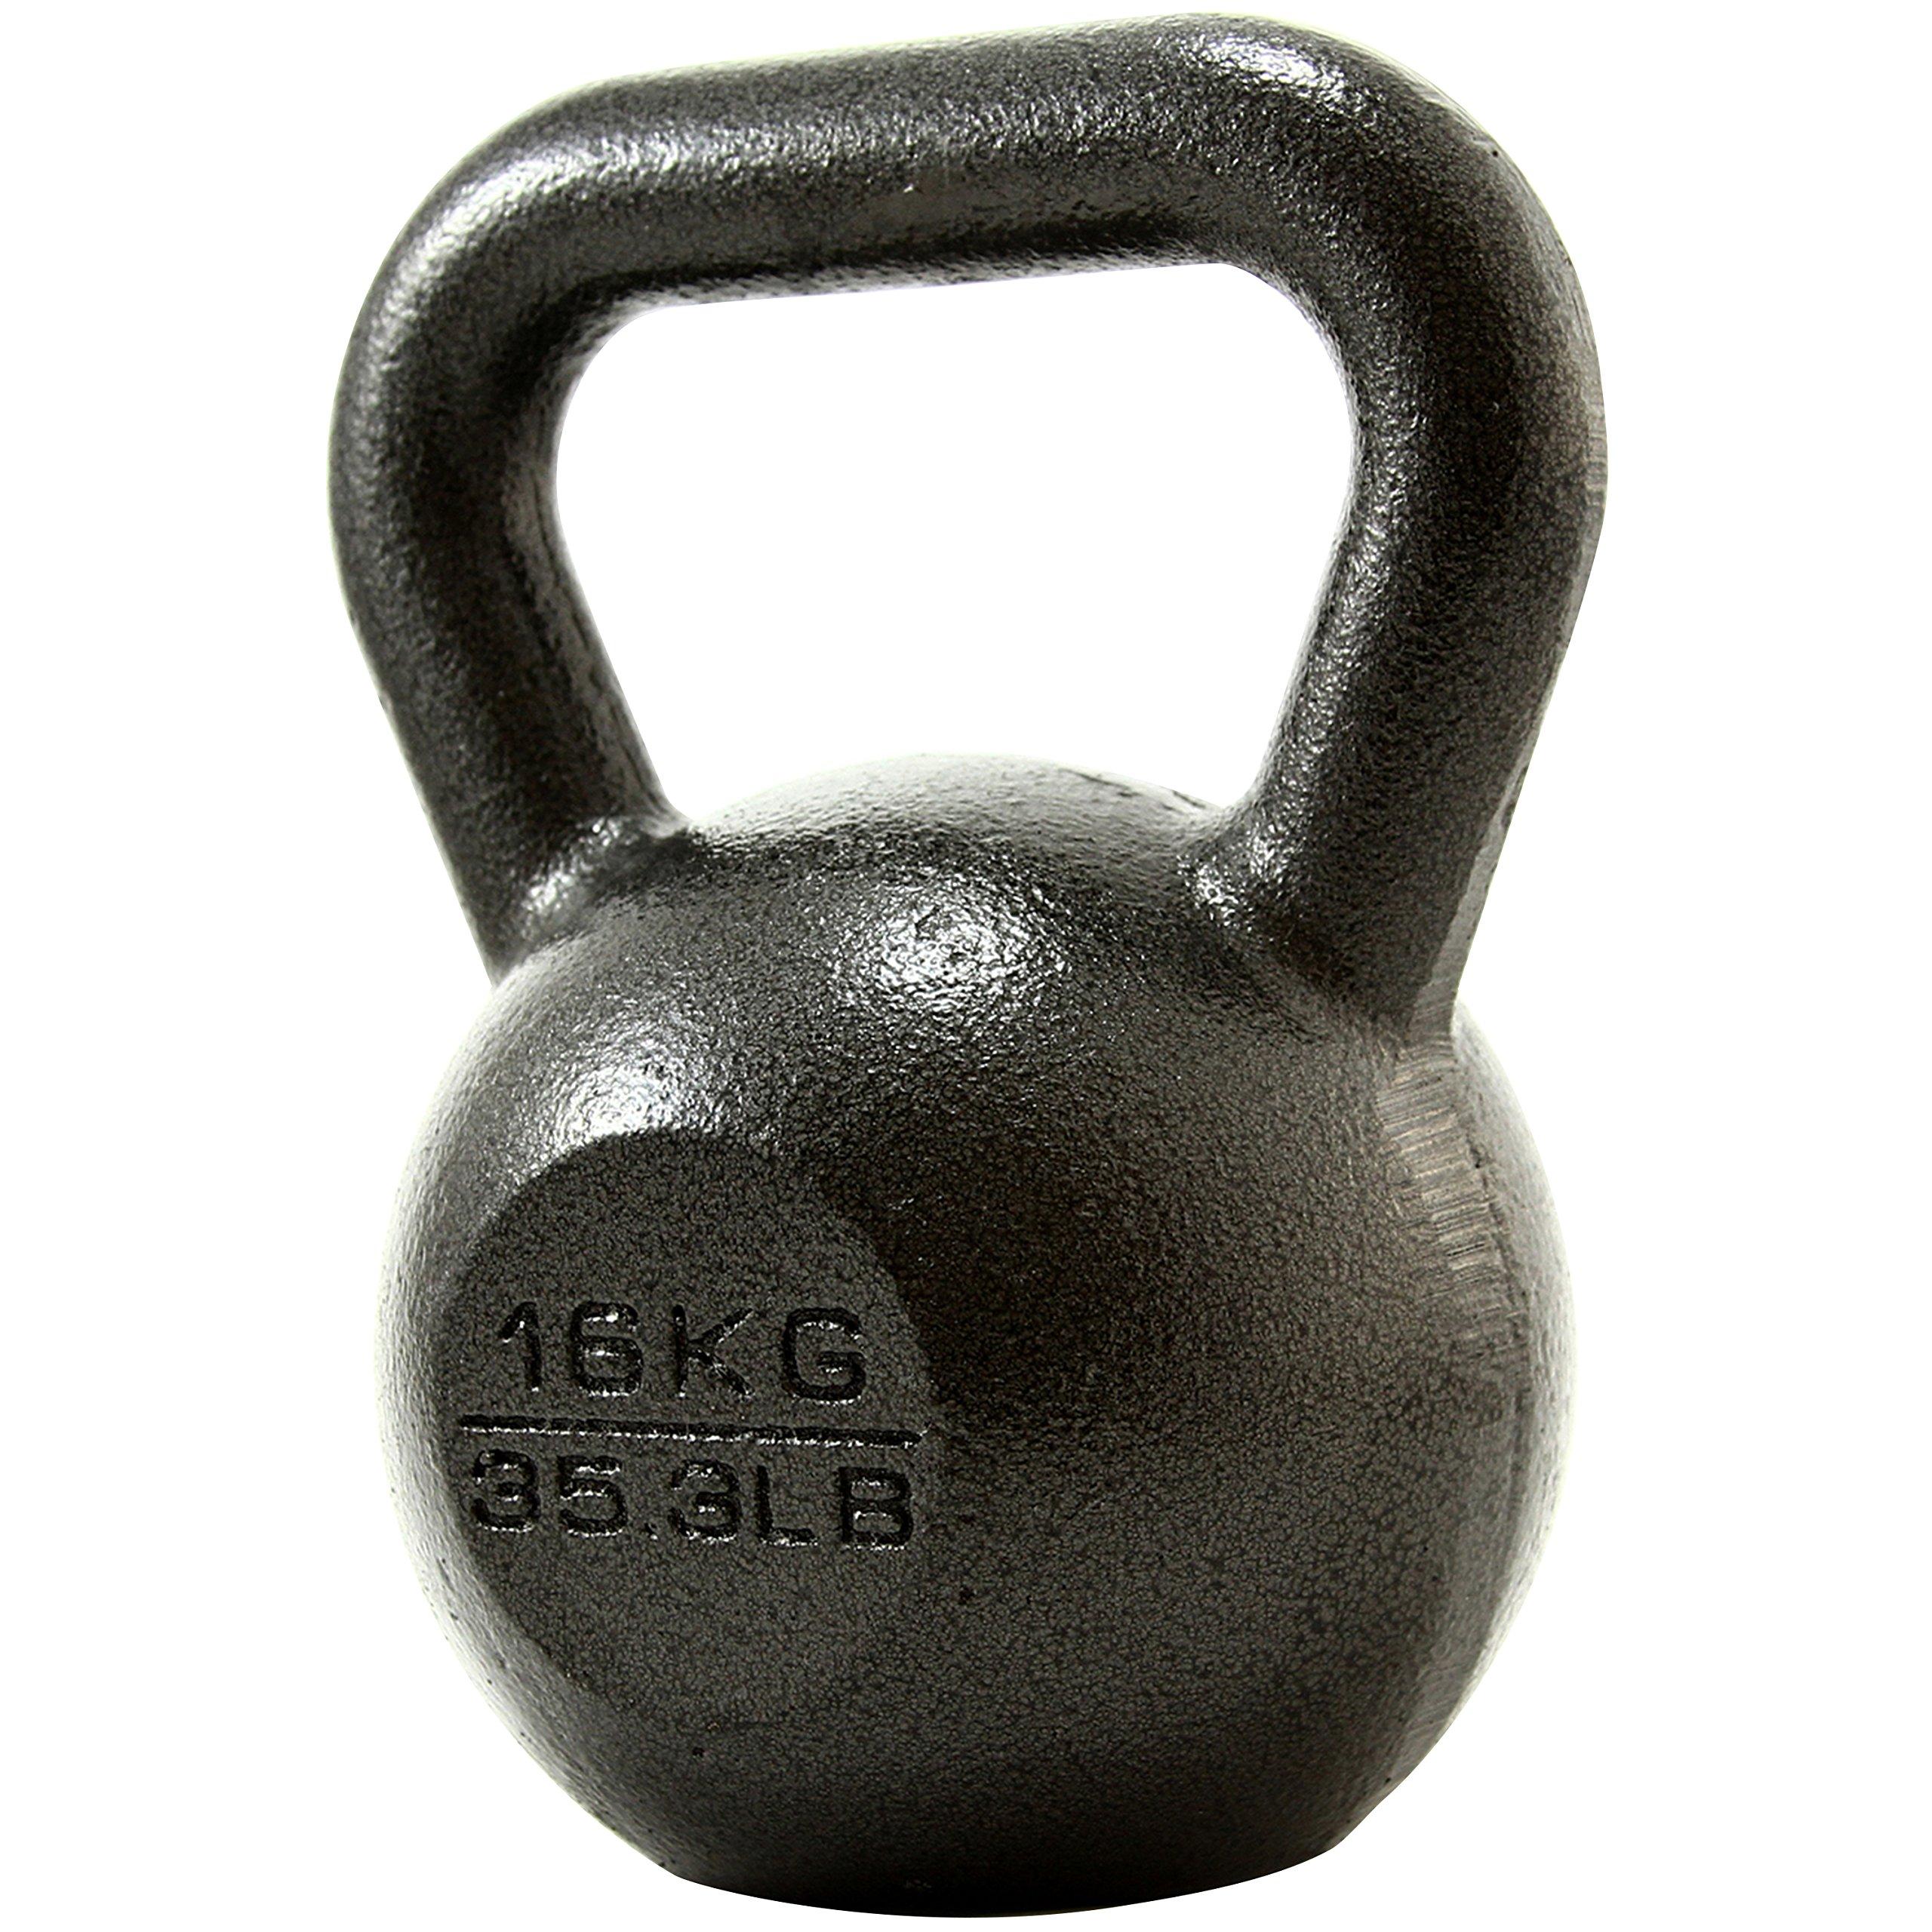 PROIRON Pesa Rusa de Hierro Fundido, Kettlebell 4kg 8kg 12kg 16kg 20kg 24kg para fisicoculturismo